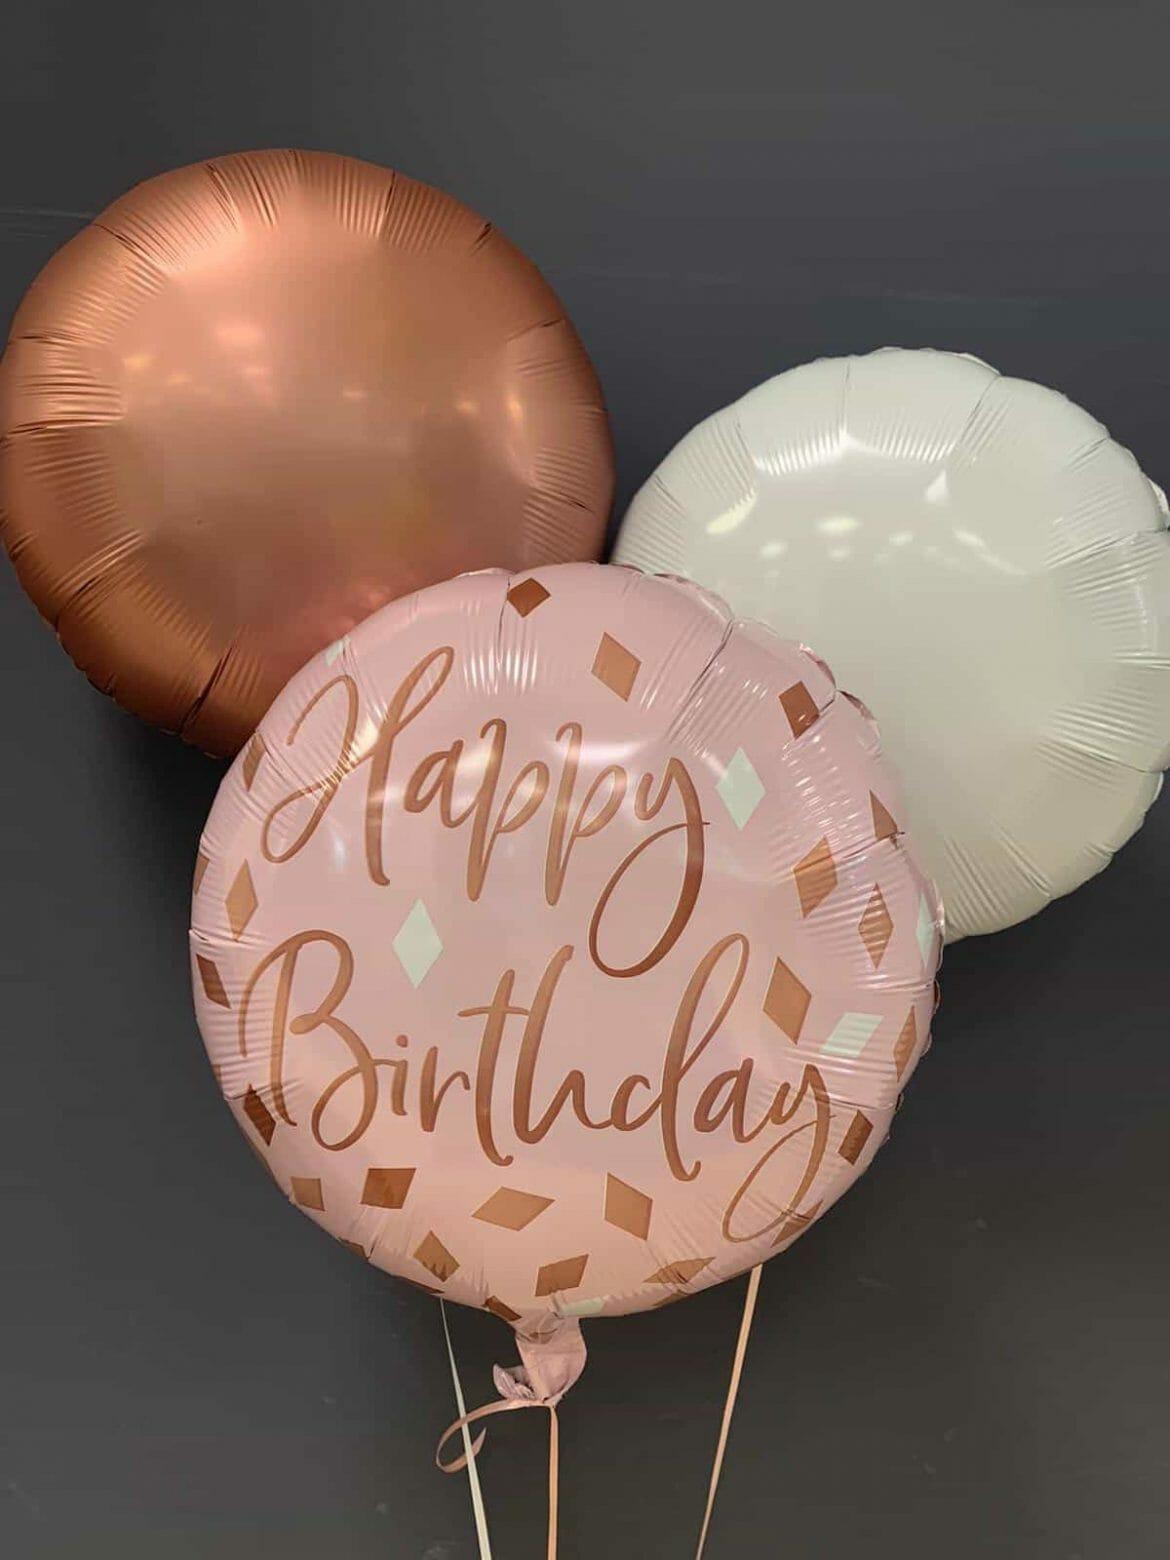 Happy Birthday € 5,50 <br> Dekoballons je € 4,50 1